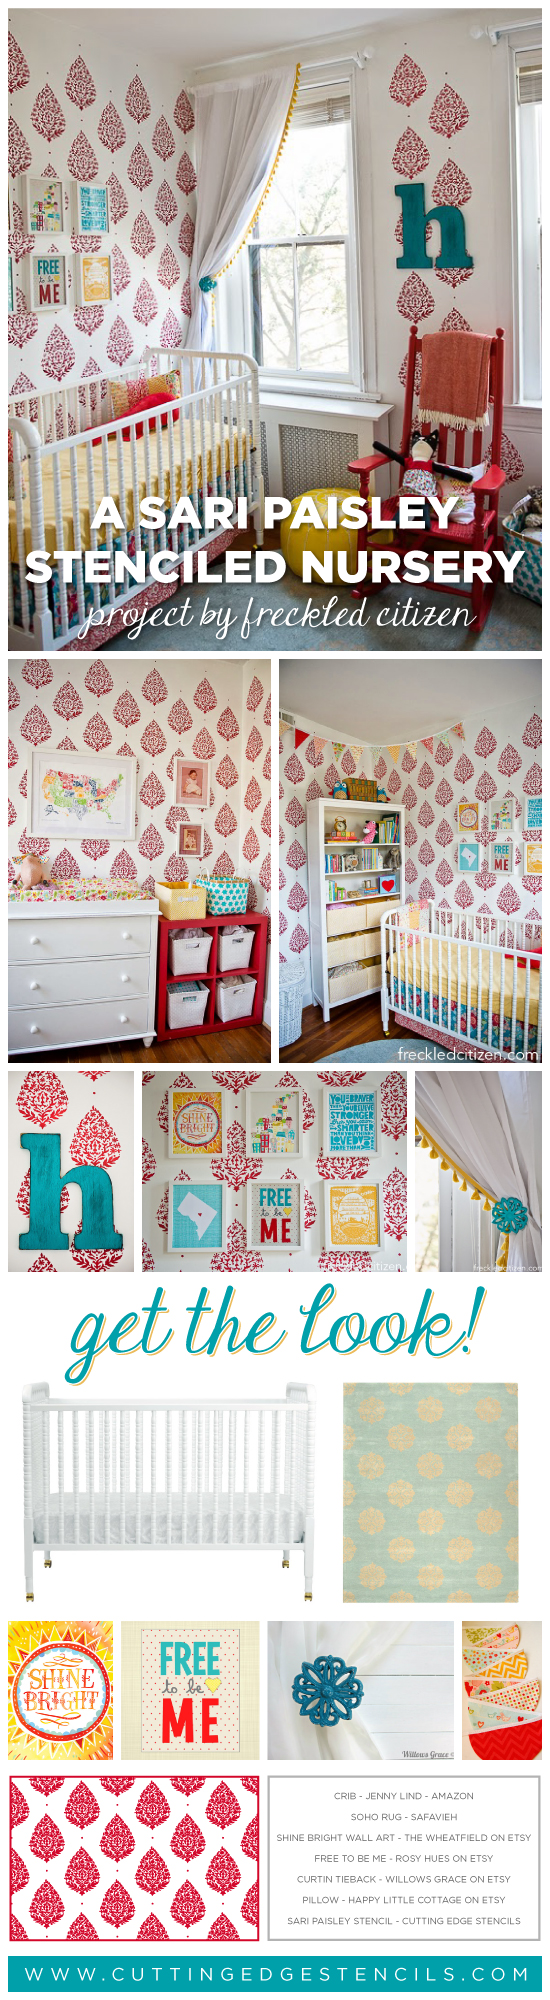 A DIY stenciled nursery featuring our Sari Pasiley pattern.. http://www.cuttingedgestencils.com/sari-paisley-allover-stencil.html